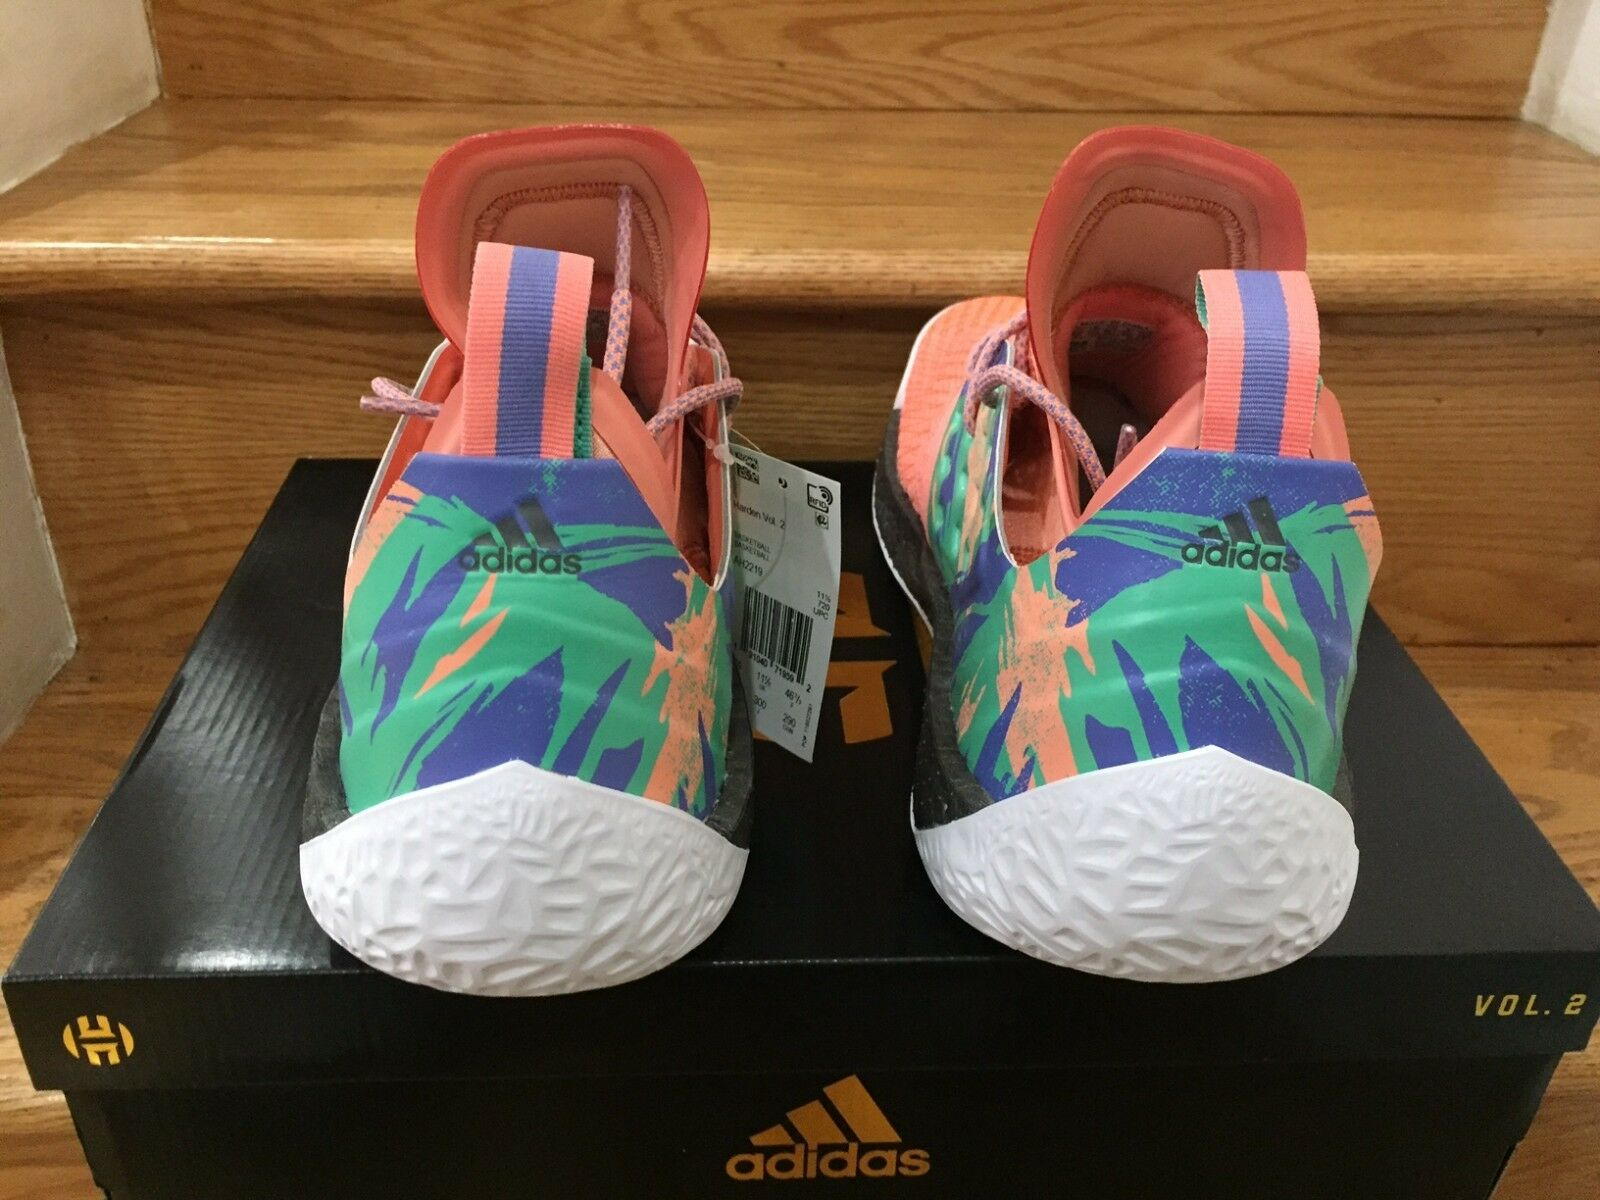 nike lebron 11 xi les frelons 616175-5 summit lake, violet 11,5 et bleu chaussures taille 11,5 violet 7f988d